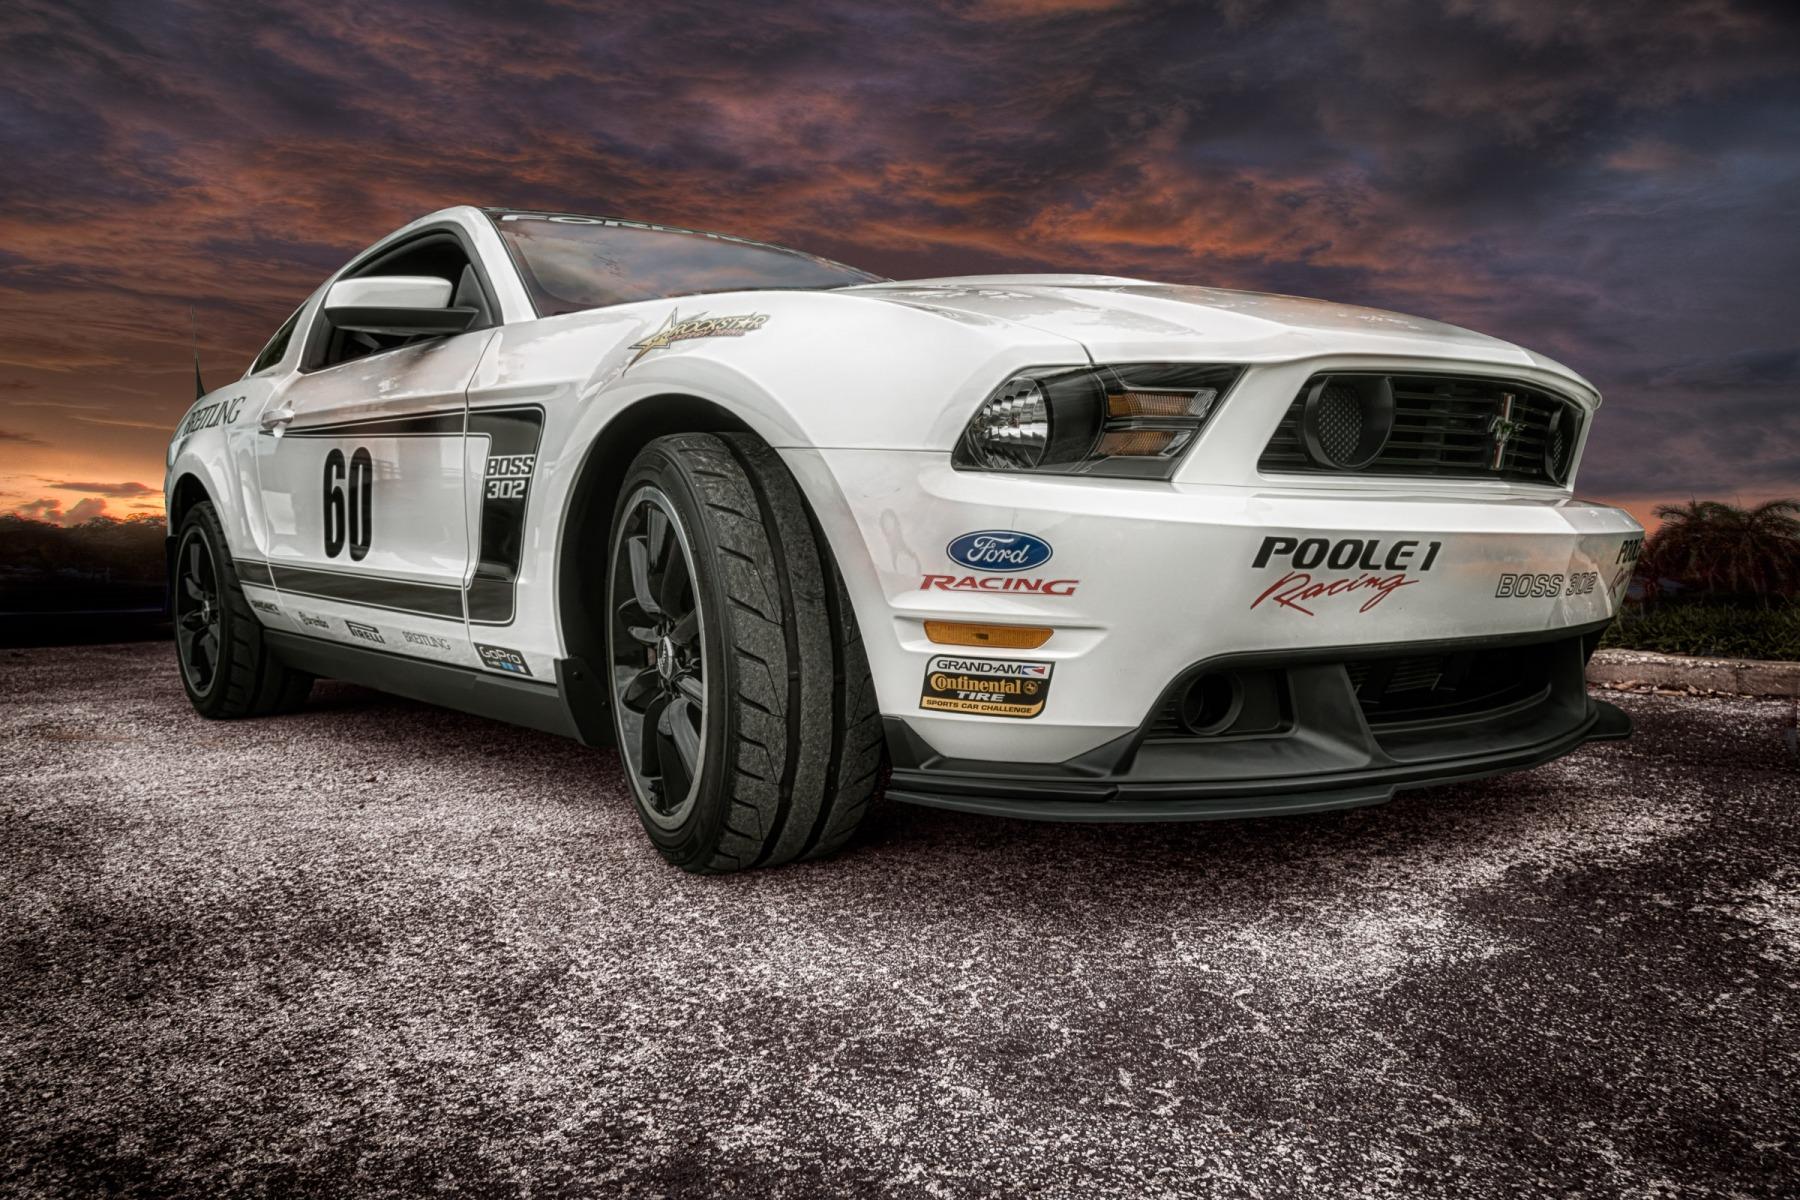 Poole Racing Mustang